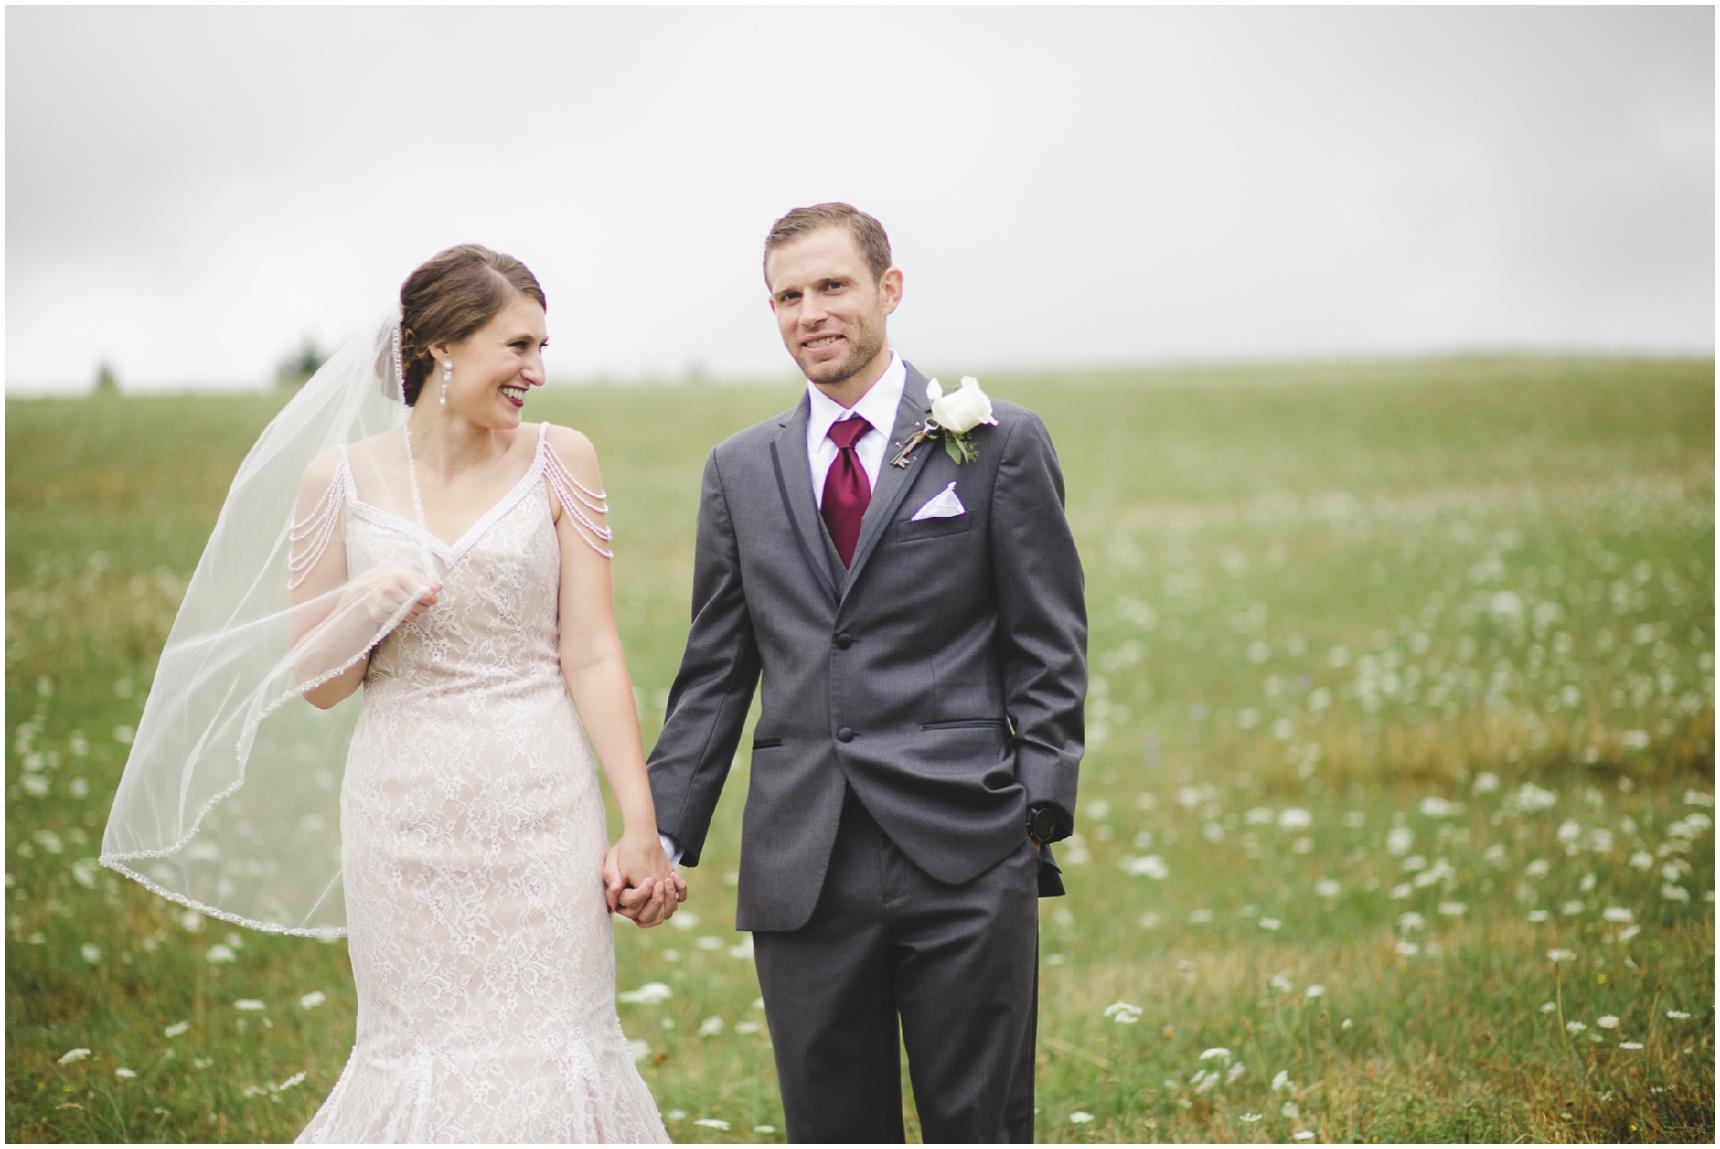 Buffalo_Wedding_Photography_Pics_046.jpg